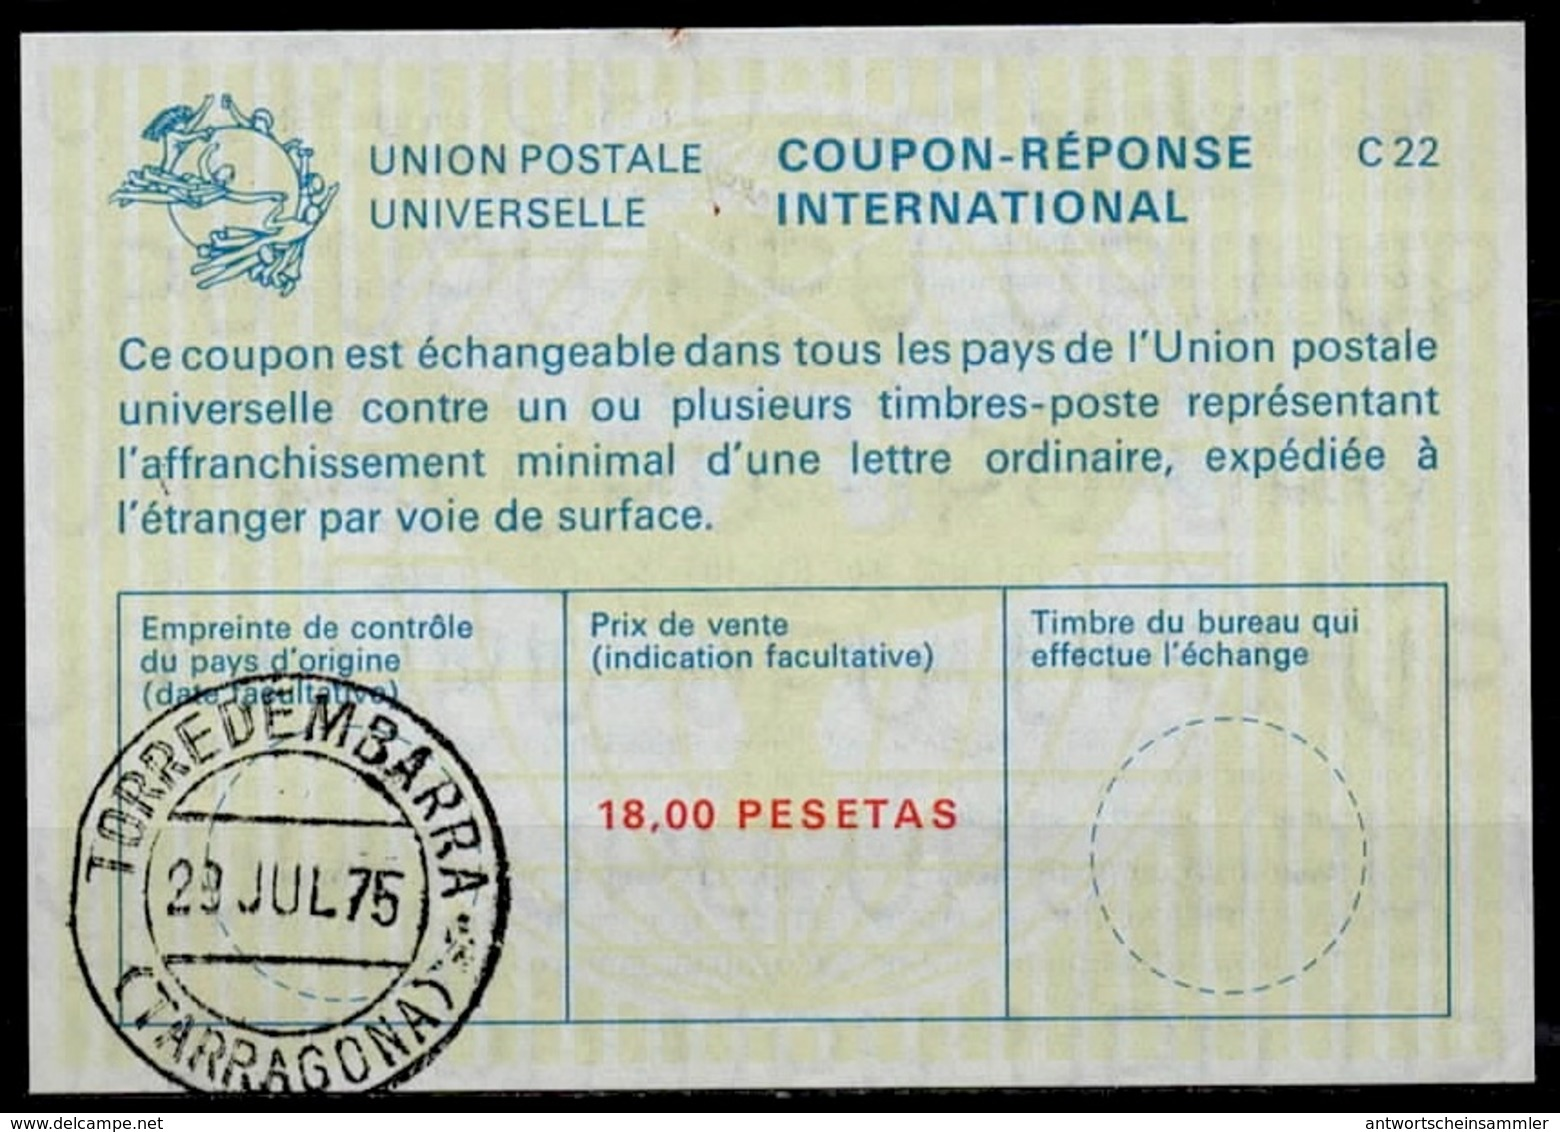 ESPAGNE / SPAIN La22A 18 PESETASInternational Reply Coupon Reponse Antwortschein IRC IAS O TORREDEMBARRA TARRAGONA - Ganzsachen